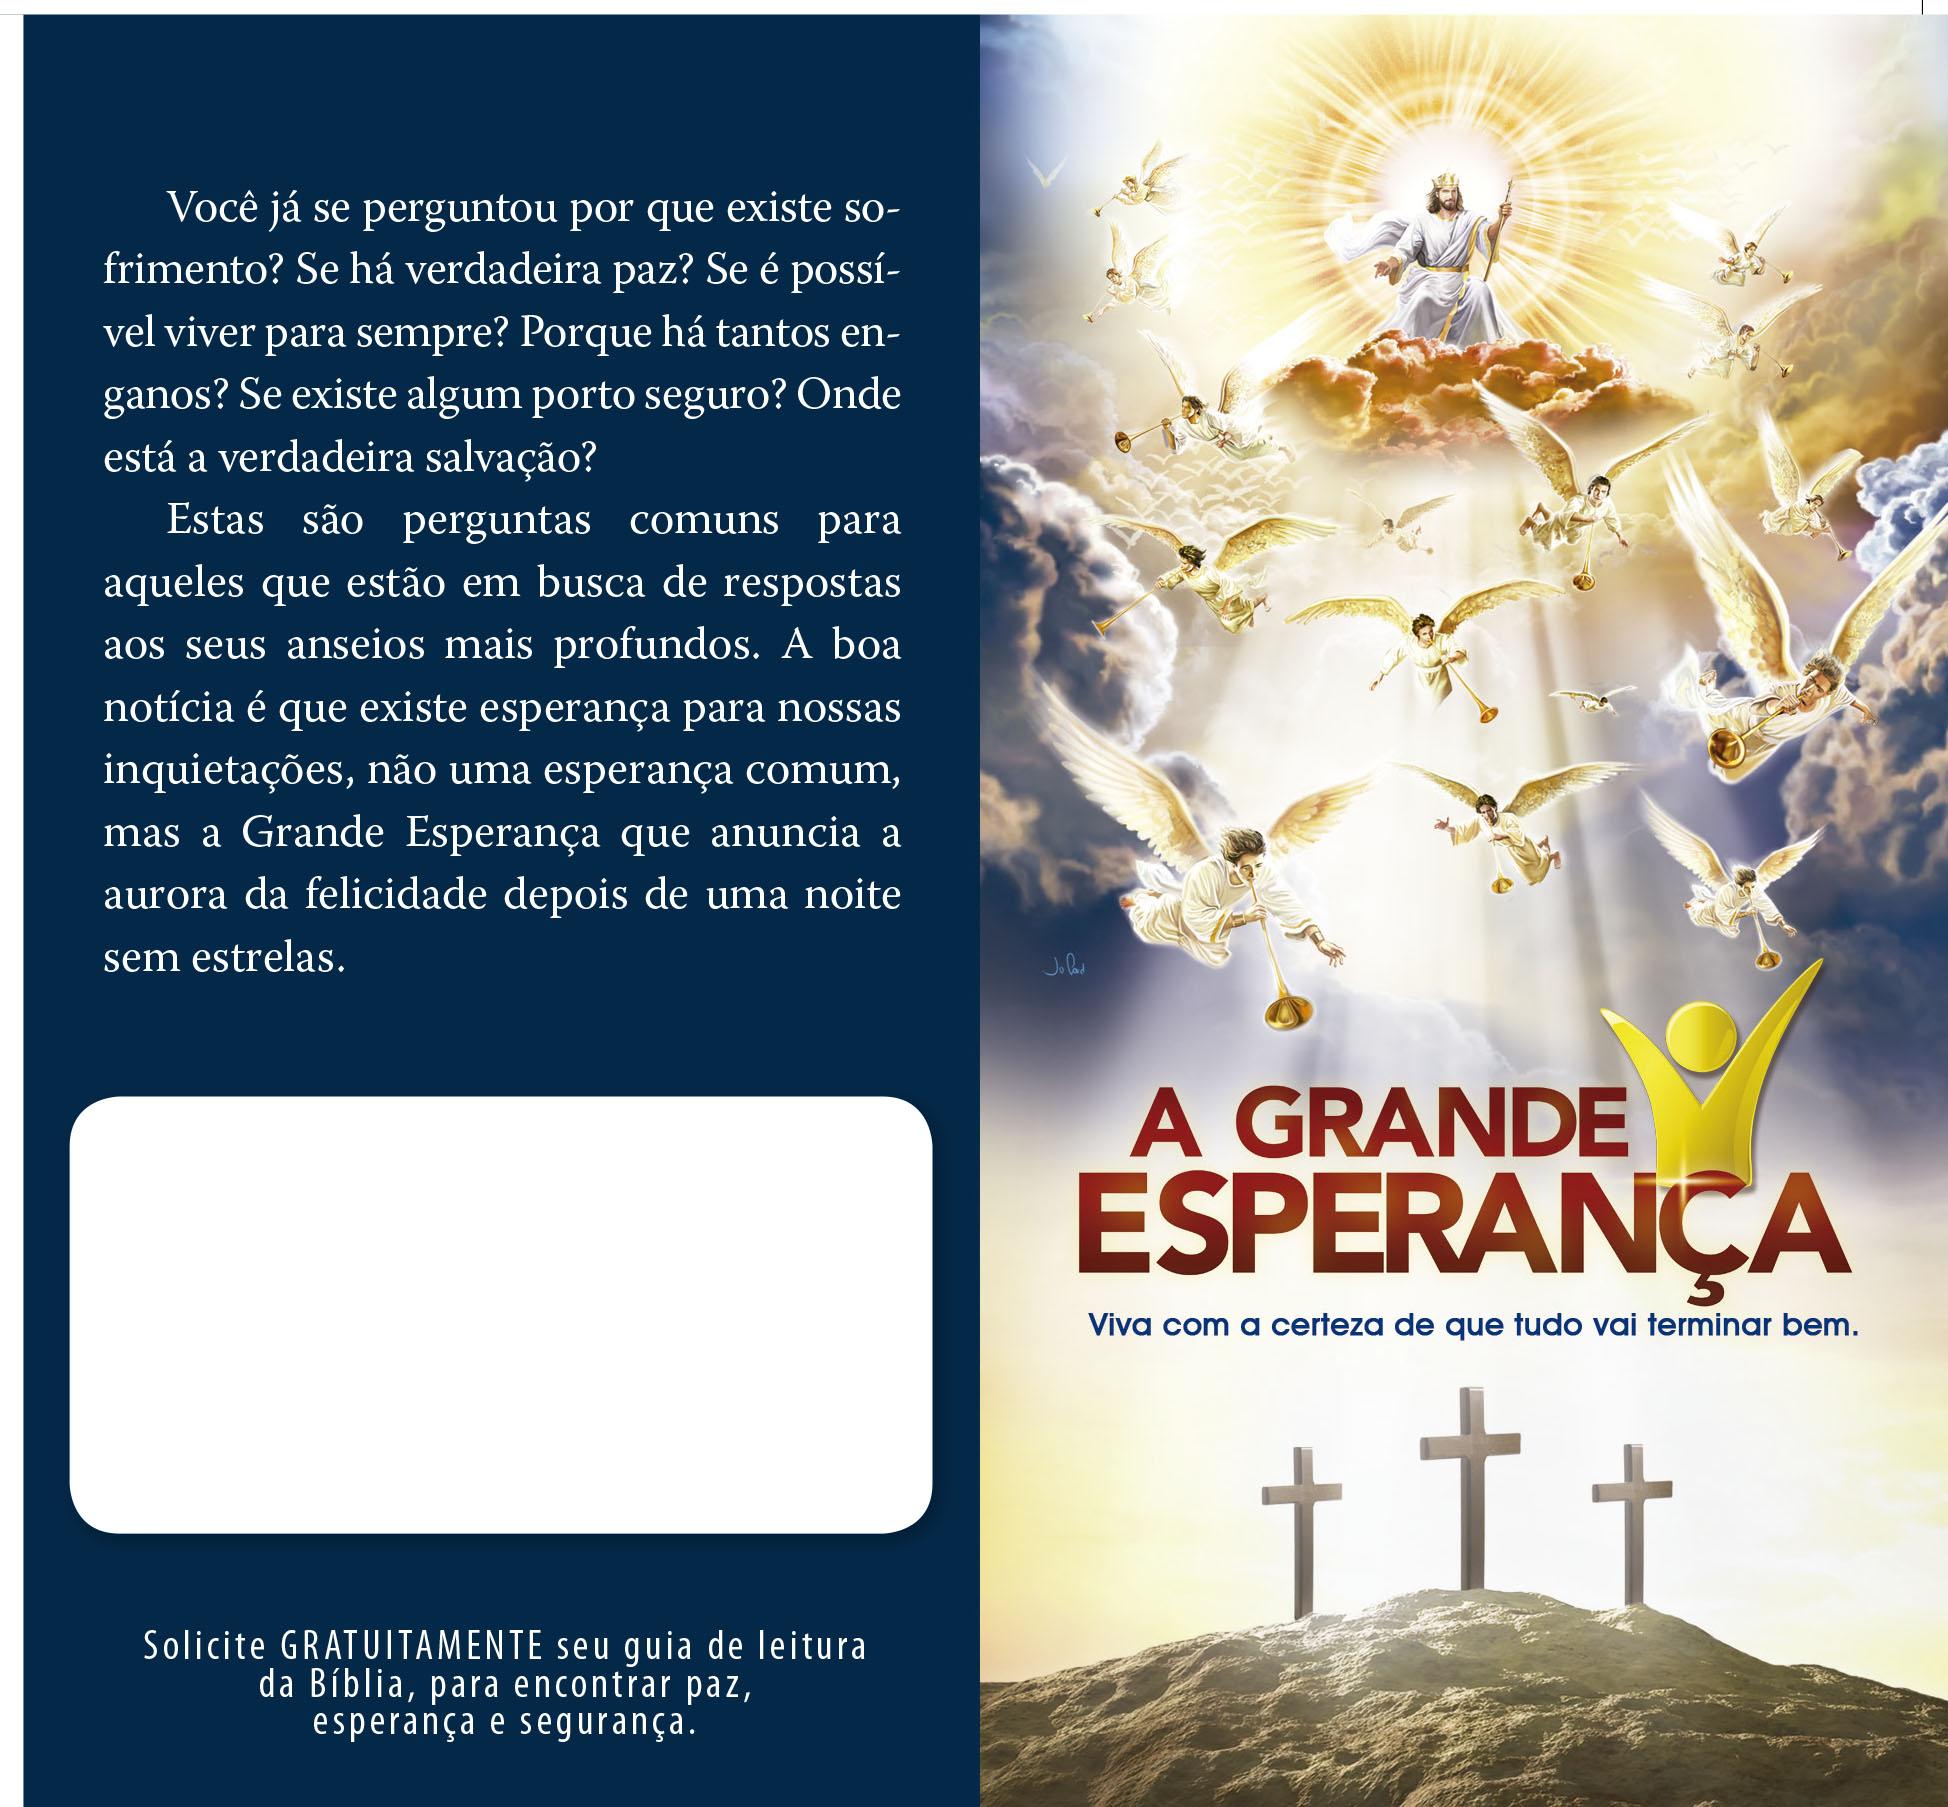 Folheto: Semana Santa 2012